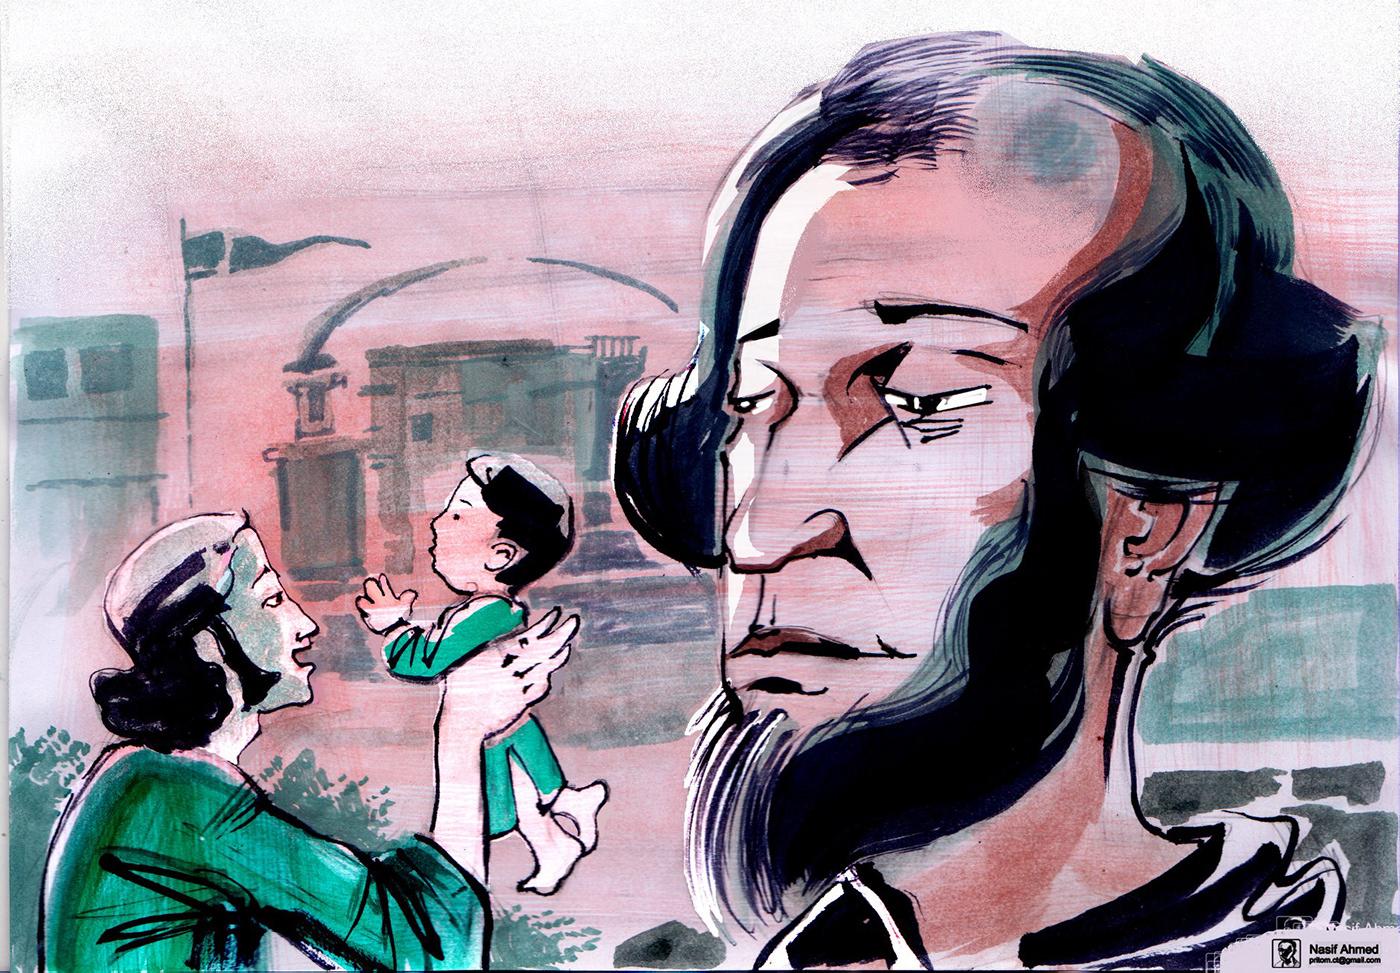 Eid Eid ul Fitr ILLUSTRATION  Ali imam story novel play watercolor digital cover design